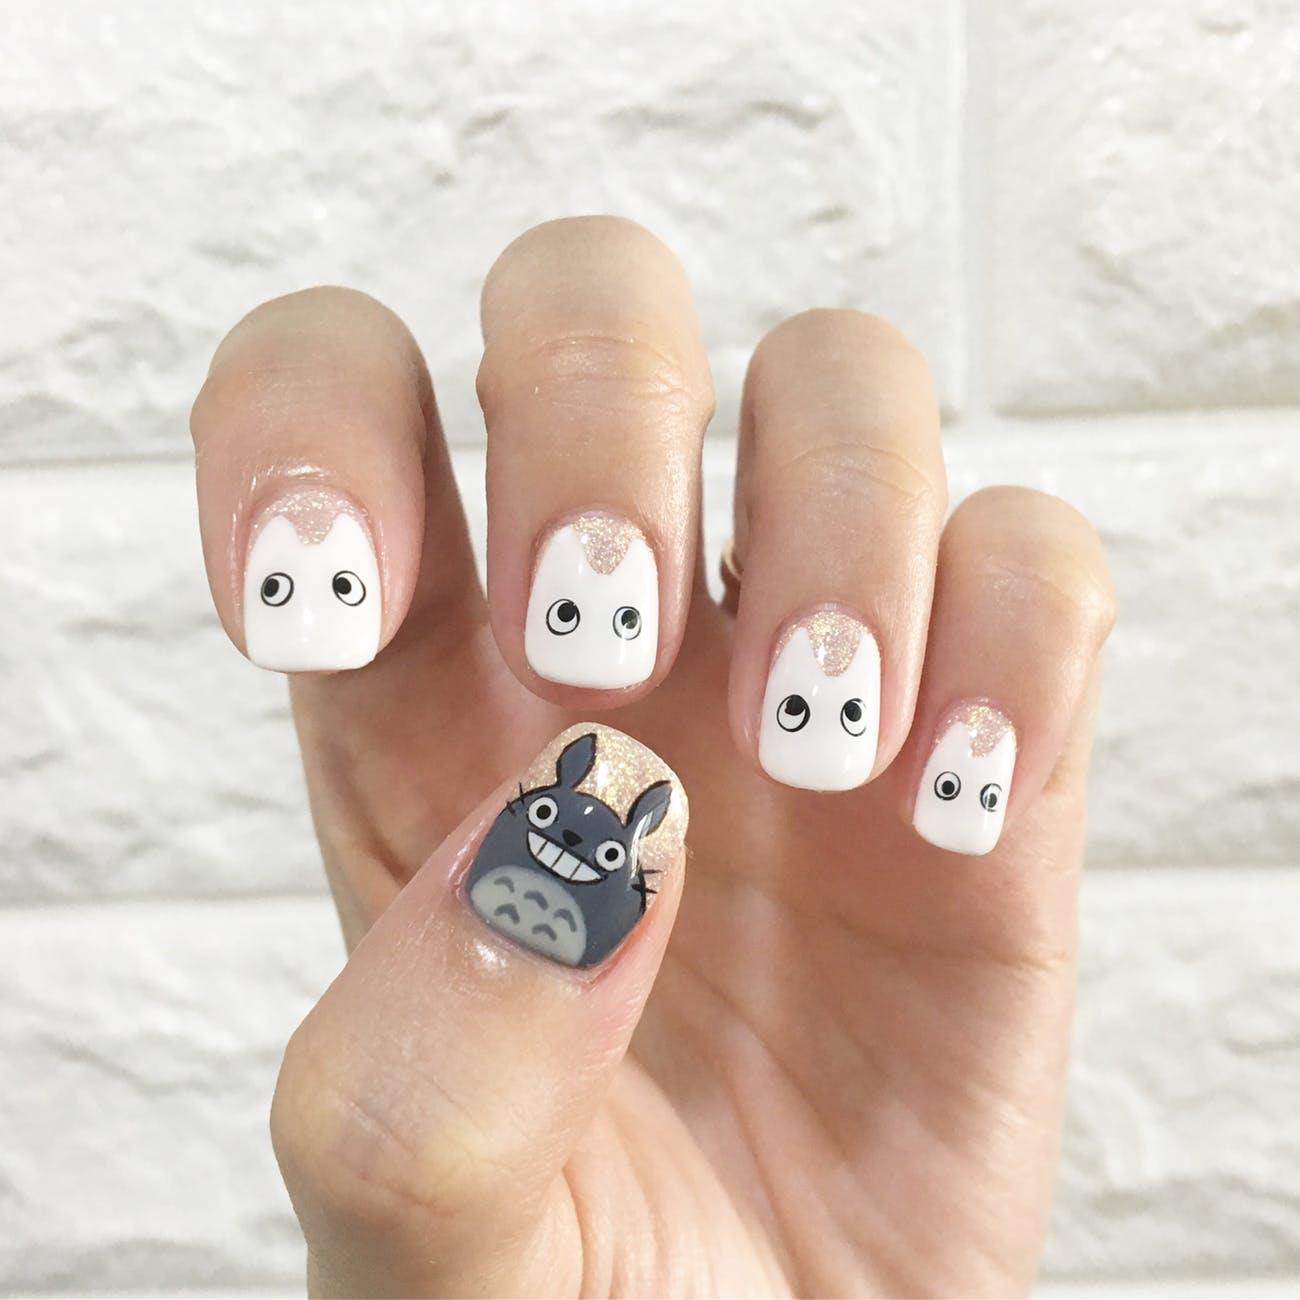 christmas home nail designs, easy home make up, zebra nail designs, cool nail designs, crazy nail designs, simple home nail designs, easy fingernail designs, basic nail designs, red nail designs, on easy home nail designs.html